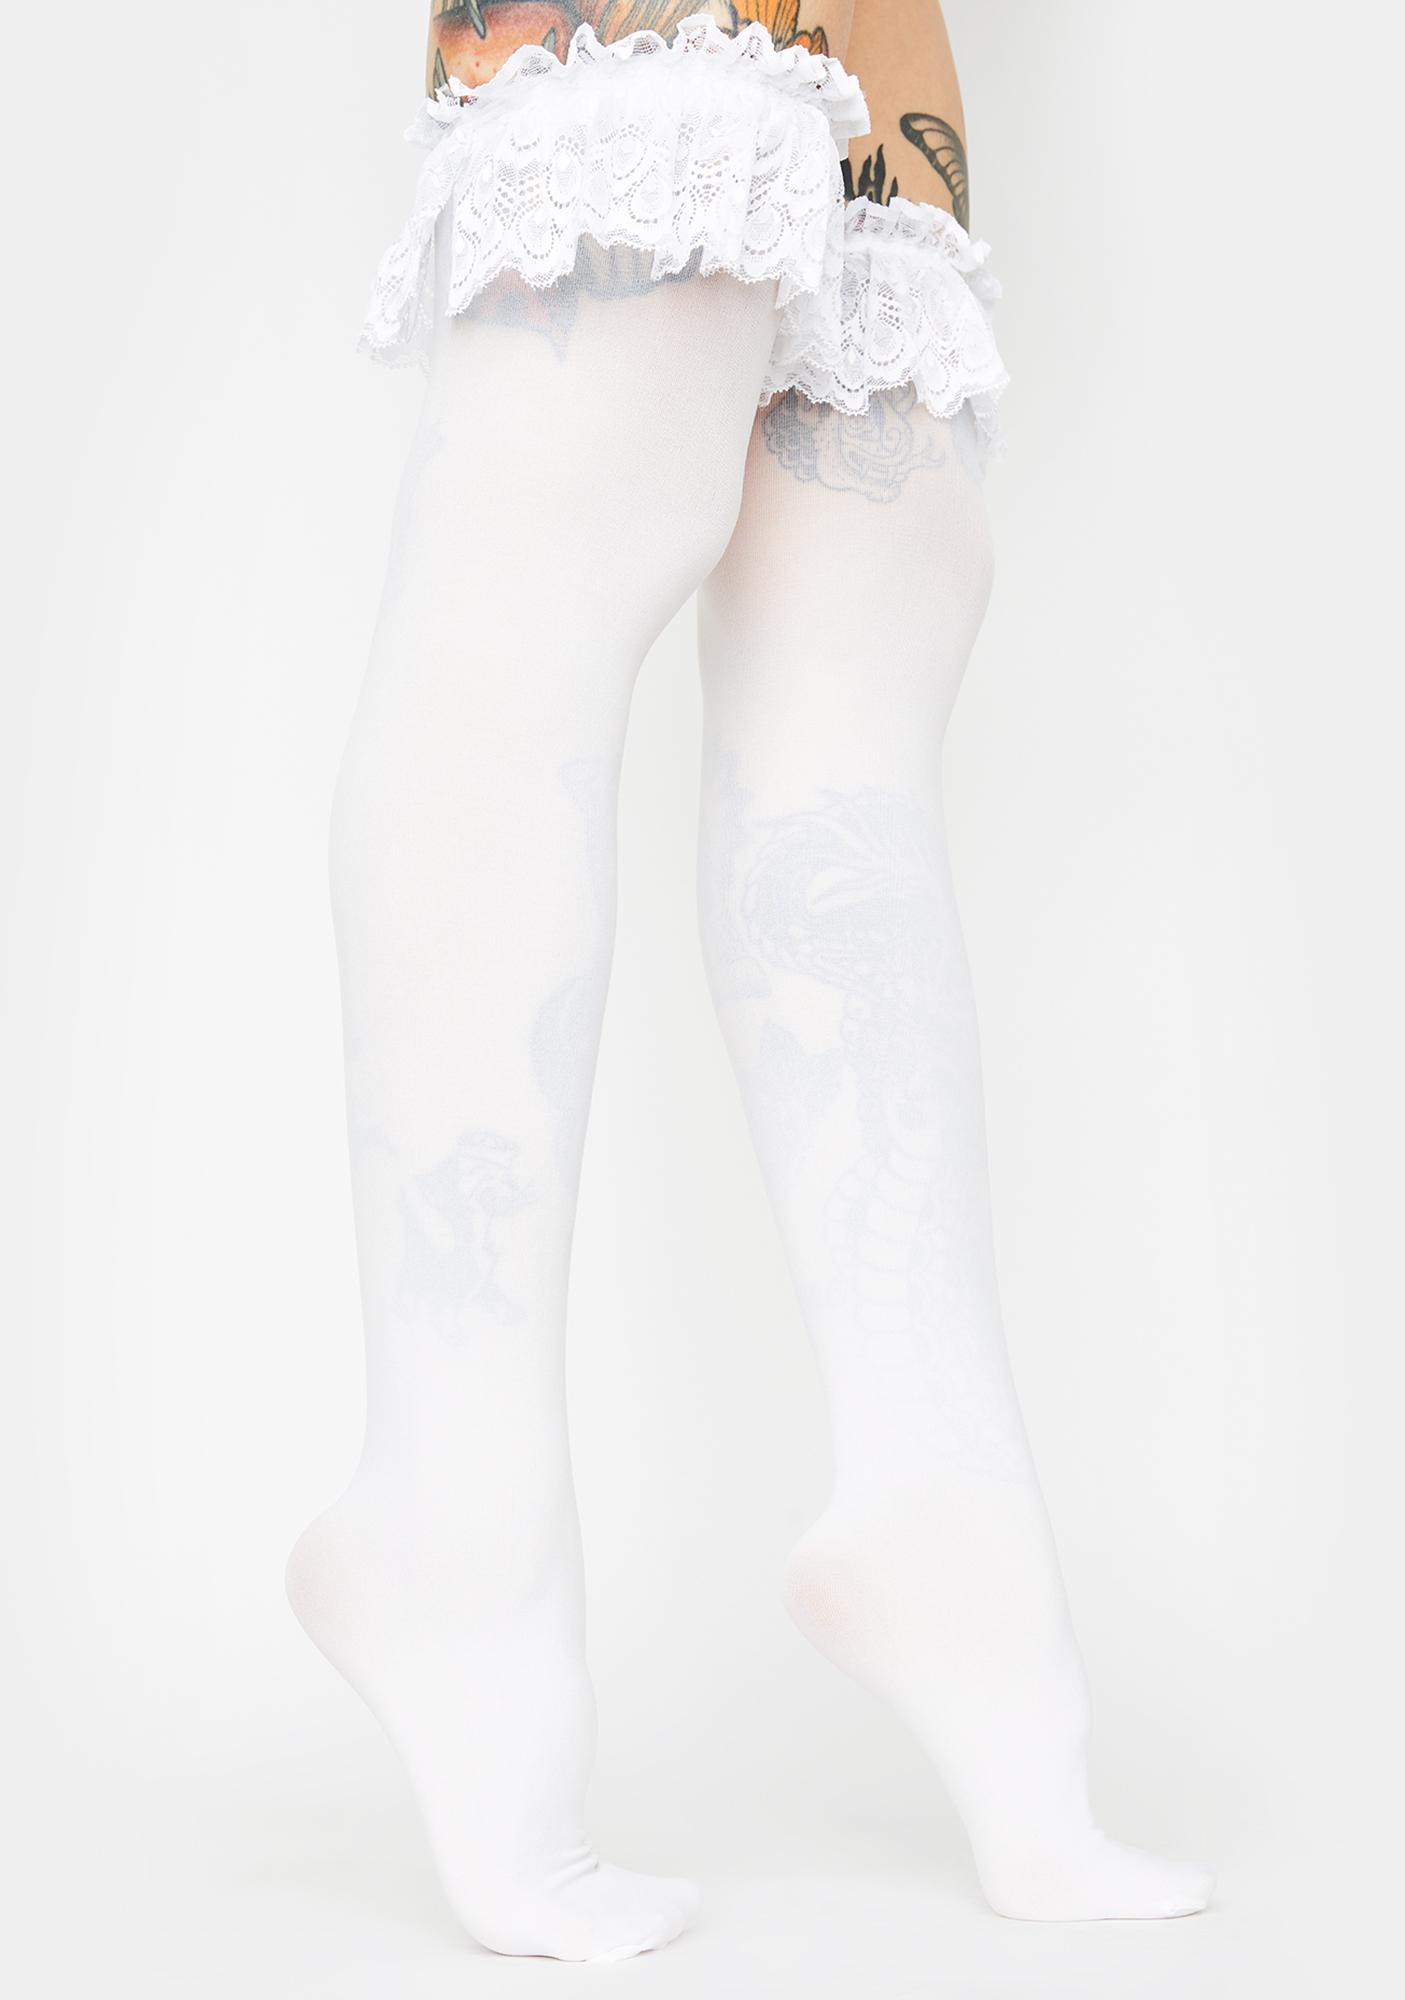 High Society Thigh High Socks